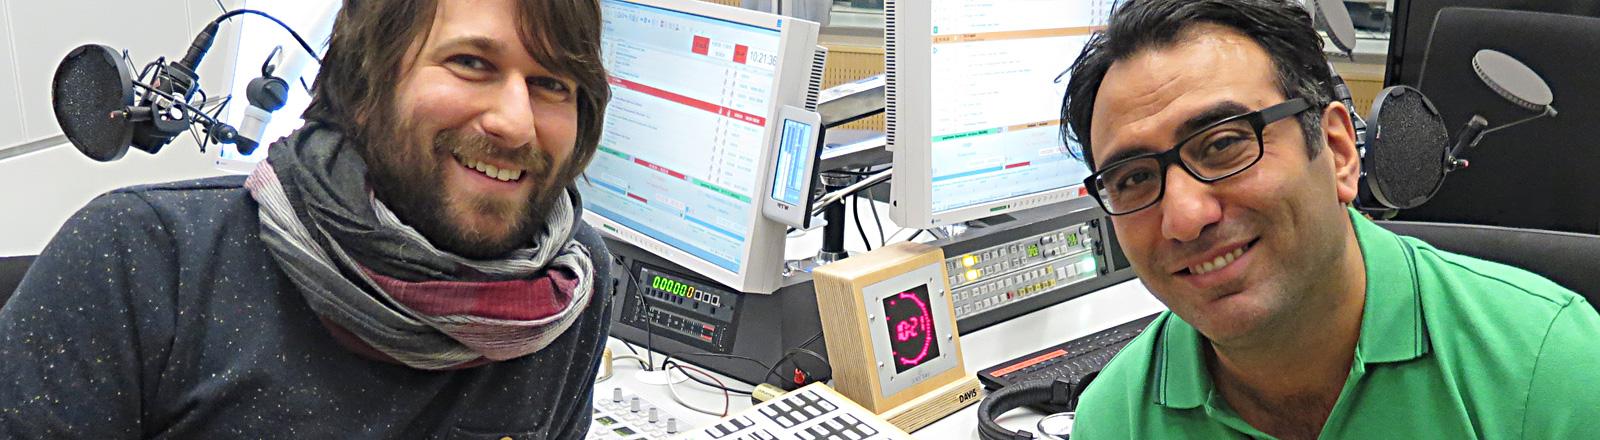 Sinan Akkus sitzt im Studio neben dem Moderator Sebastian Sonntag.